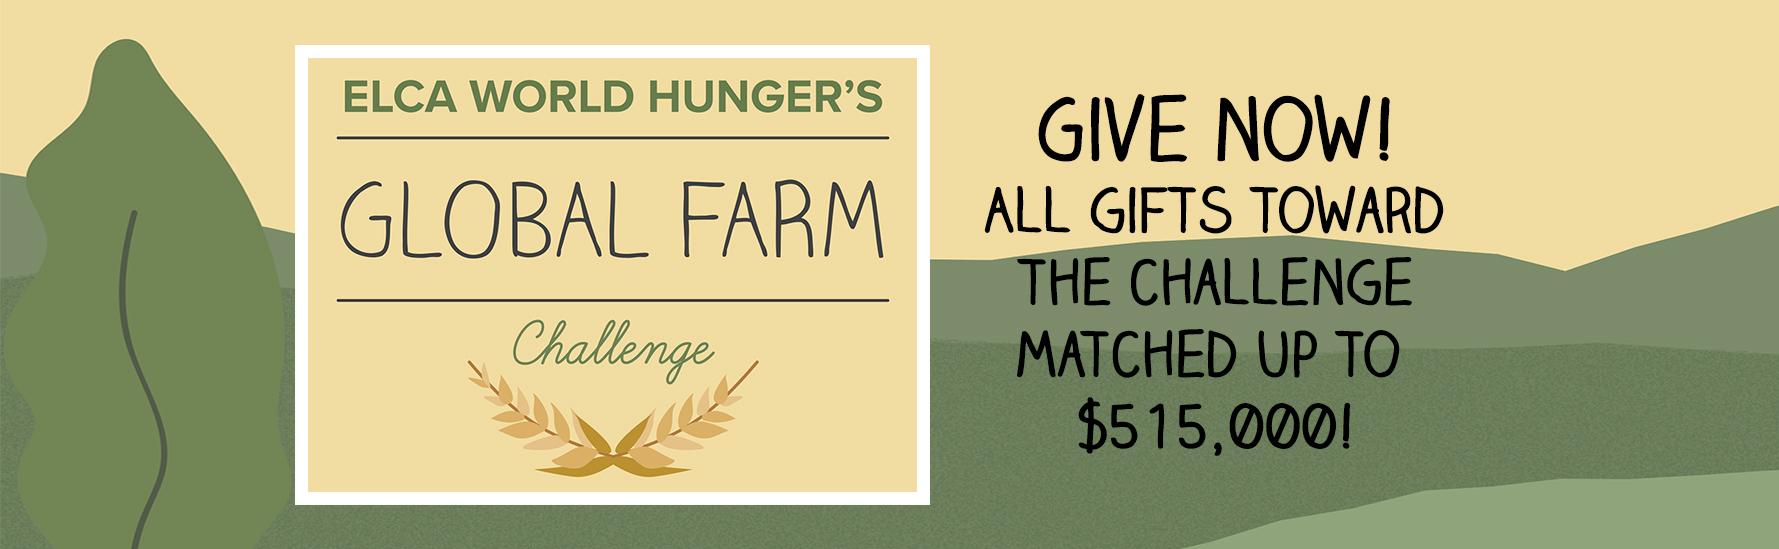 Global Farm Challenge